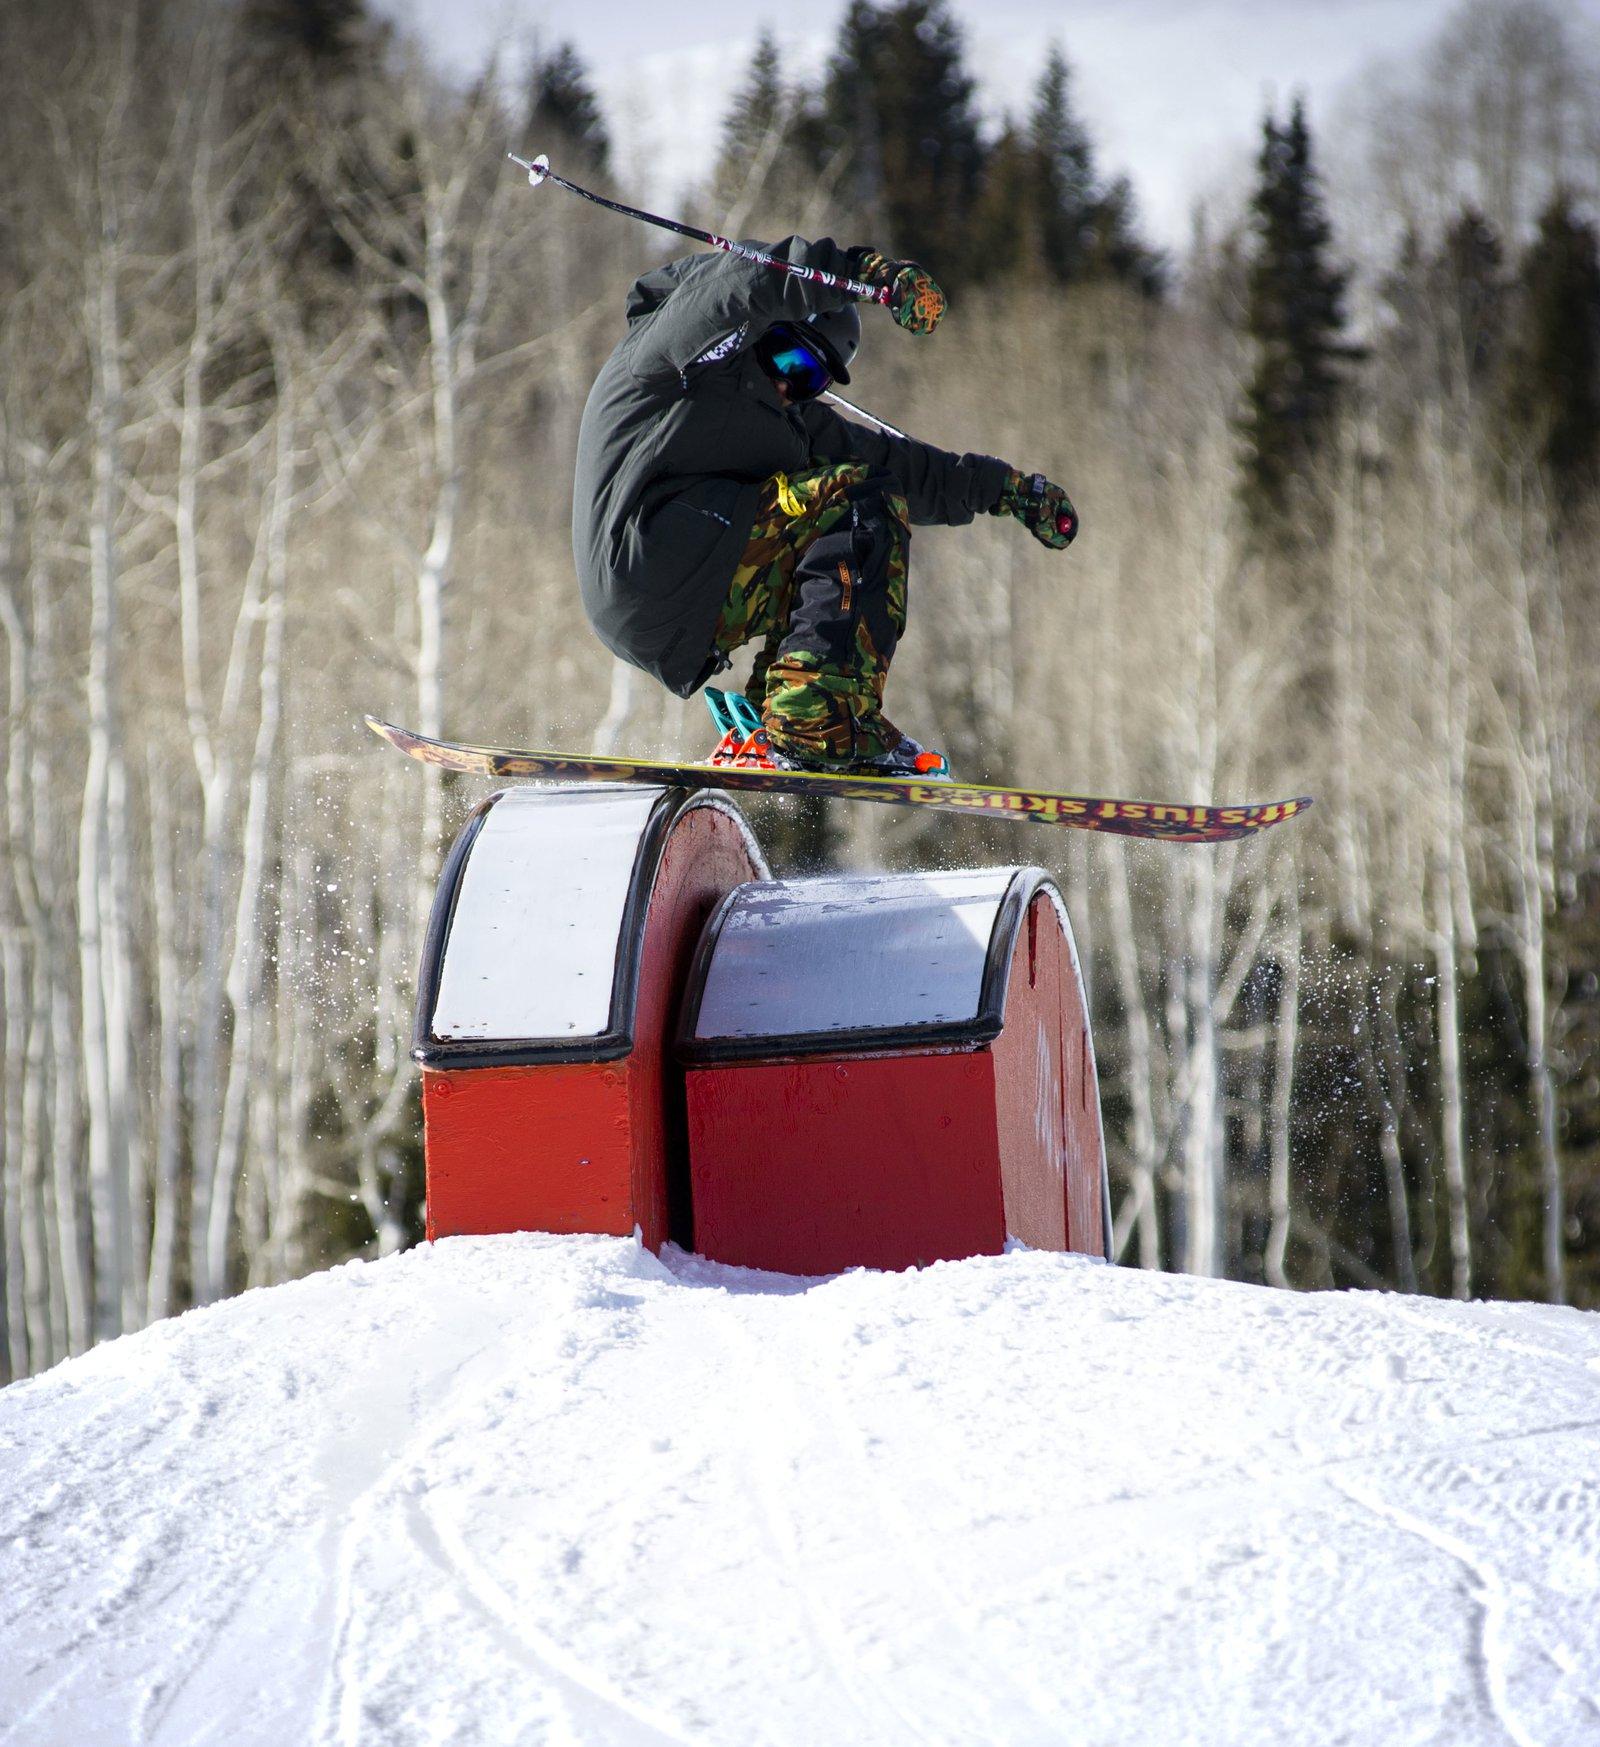 The Lowdown -- J Skis gets down